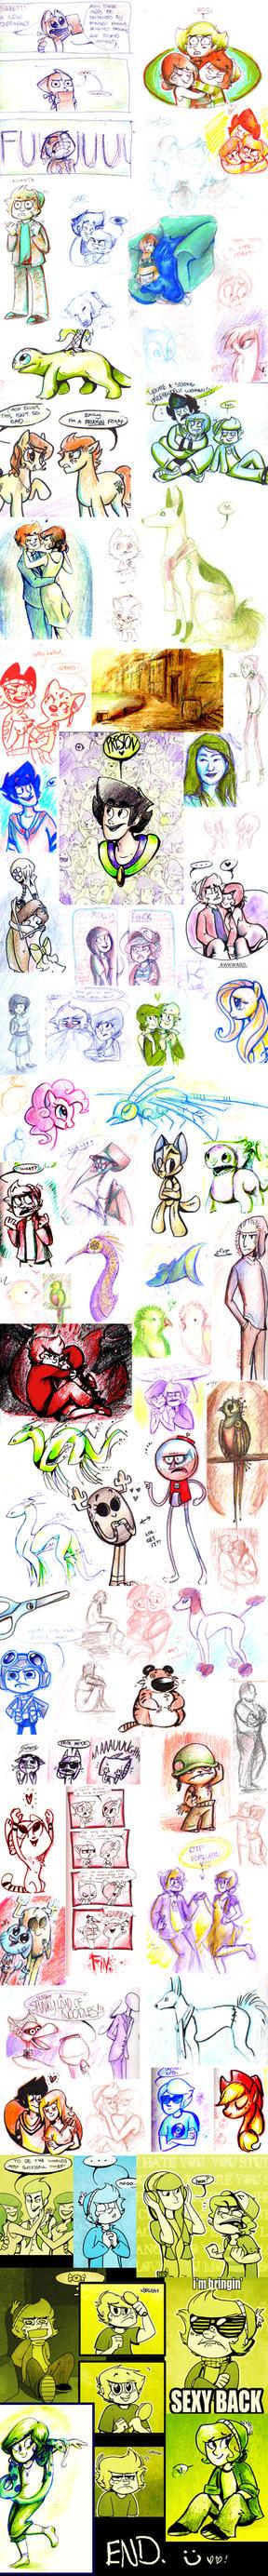 Sketchdump 3 or whatever by Zakeno